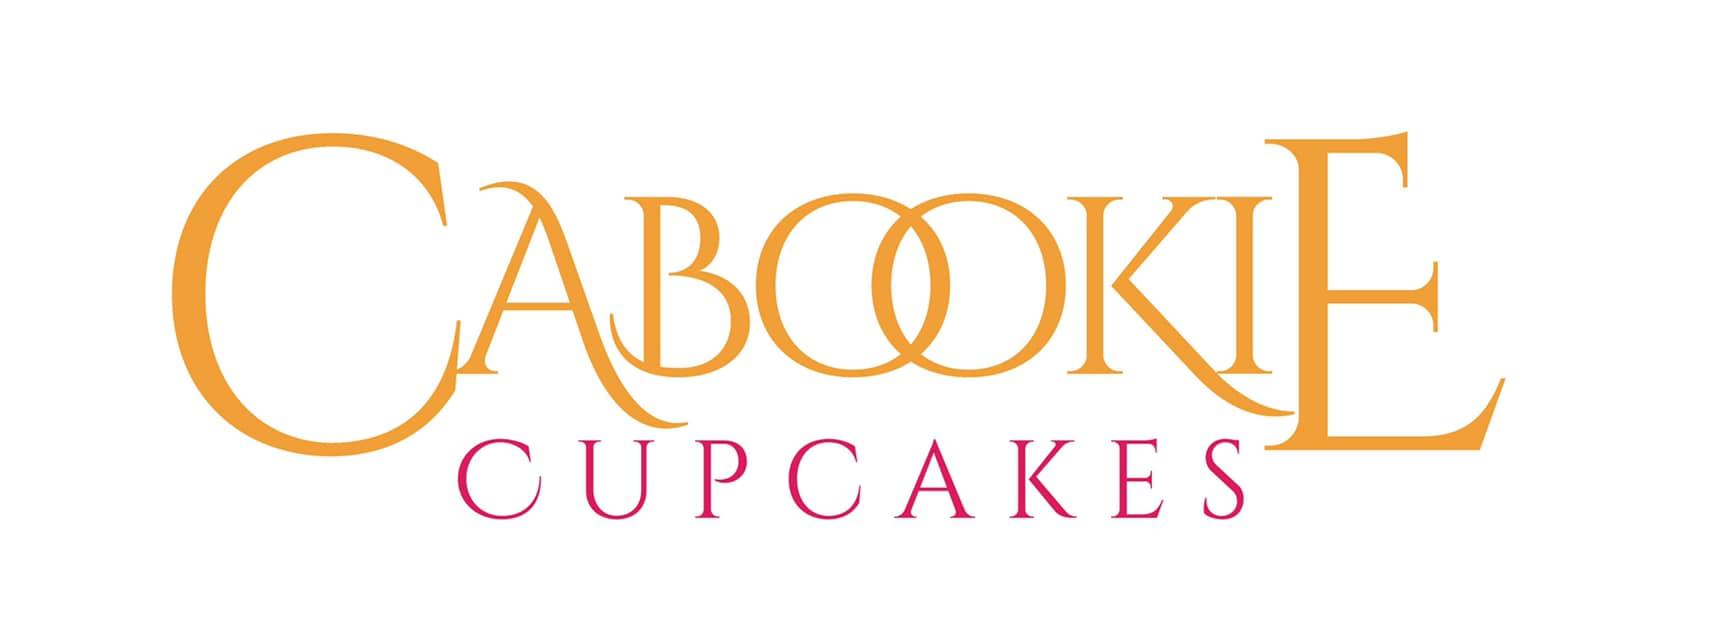 Cabookie Cupcakes Logo